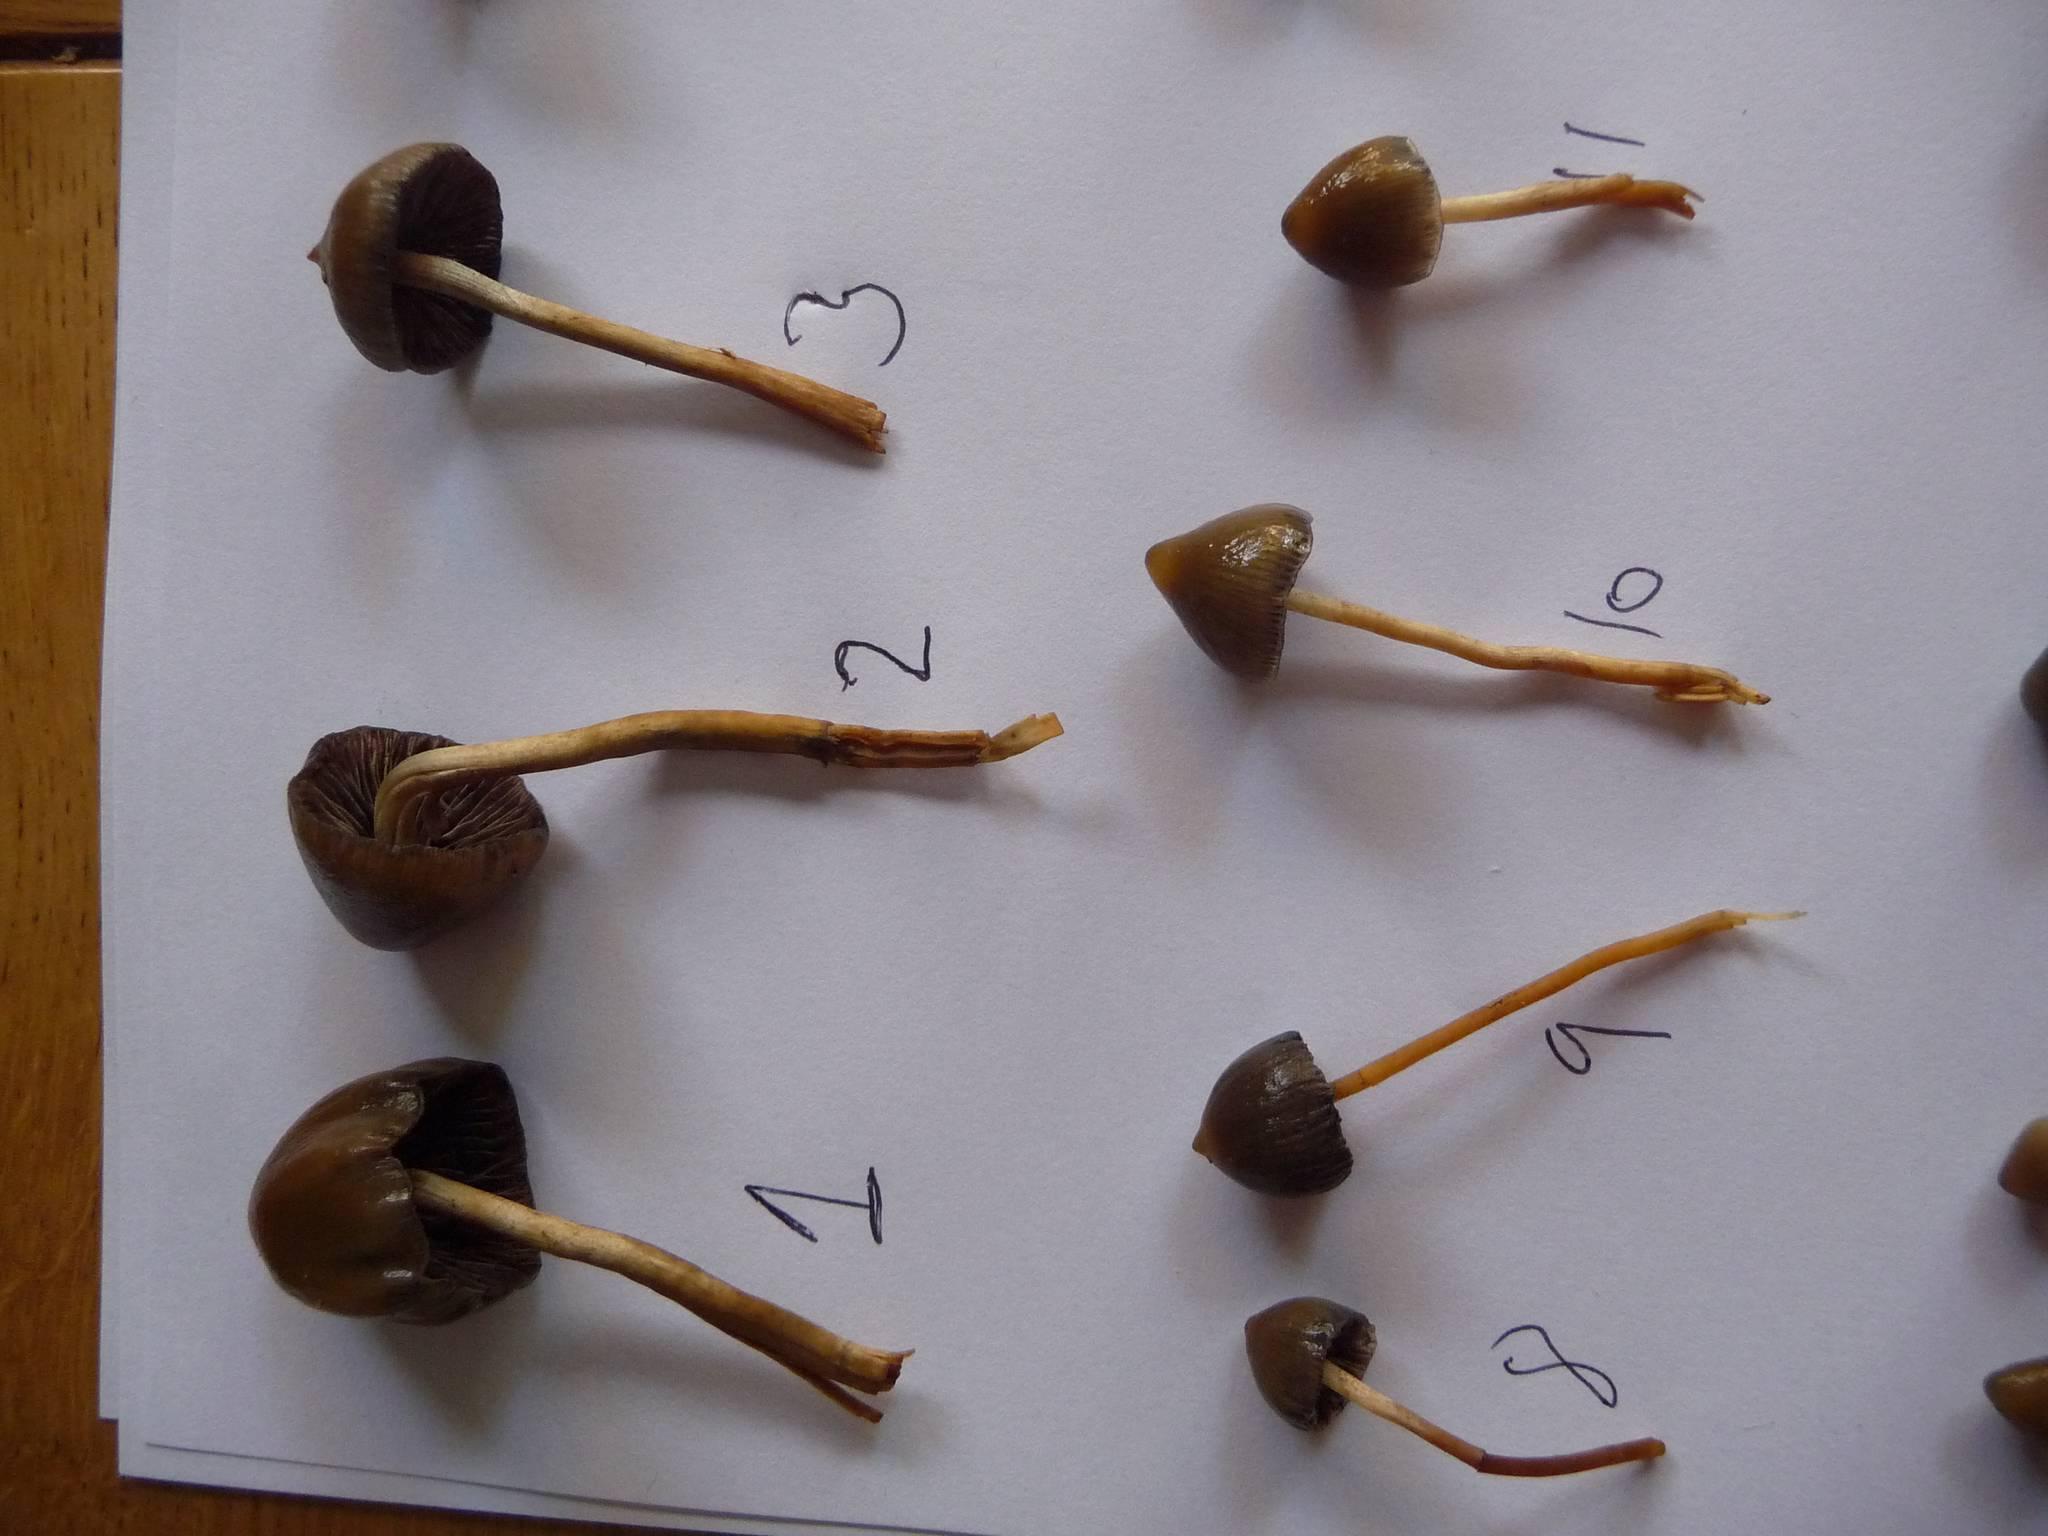 Liberty Cap Id Mushroom Hunting And Identification